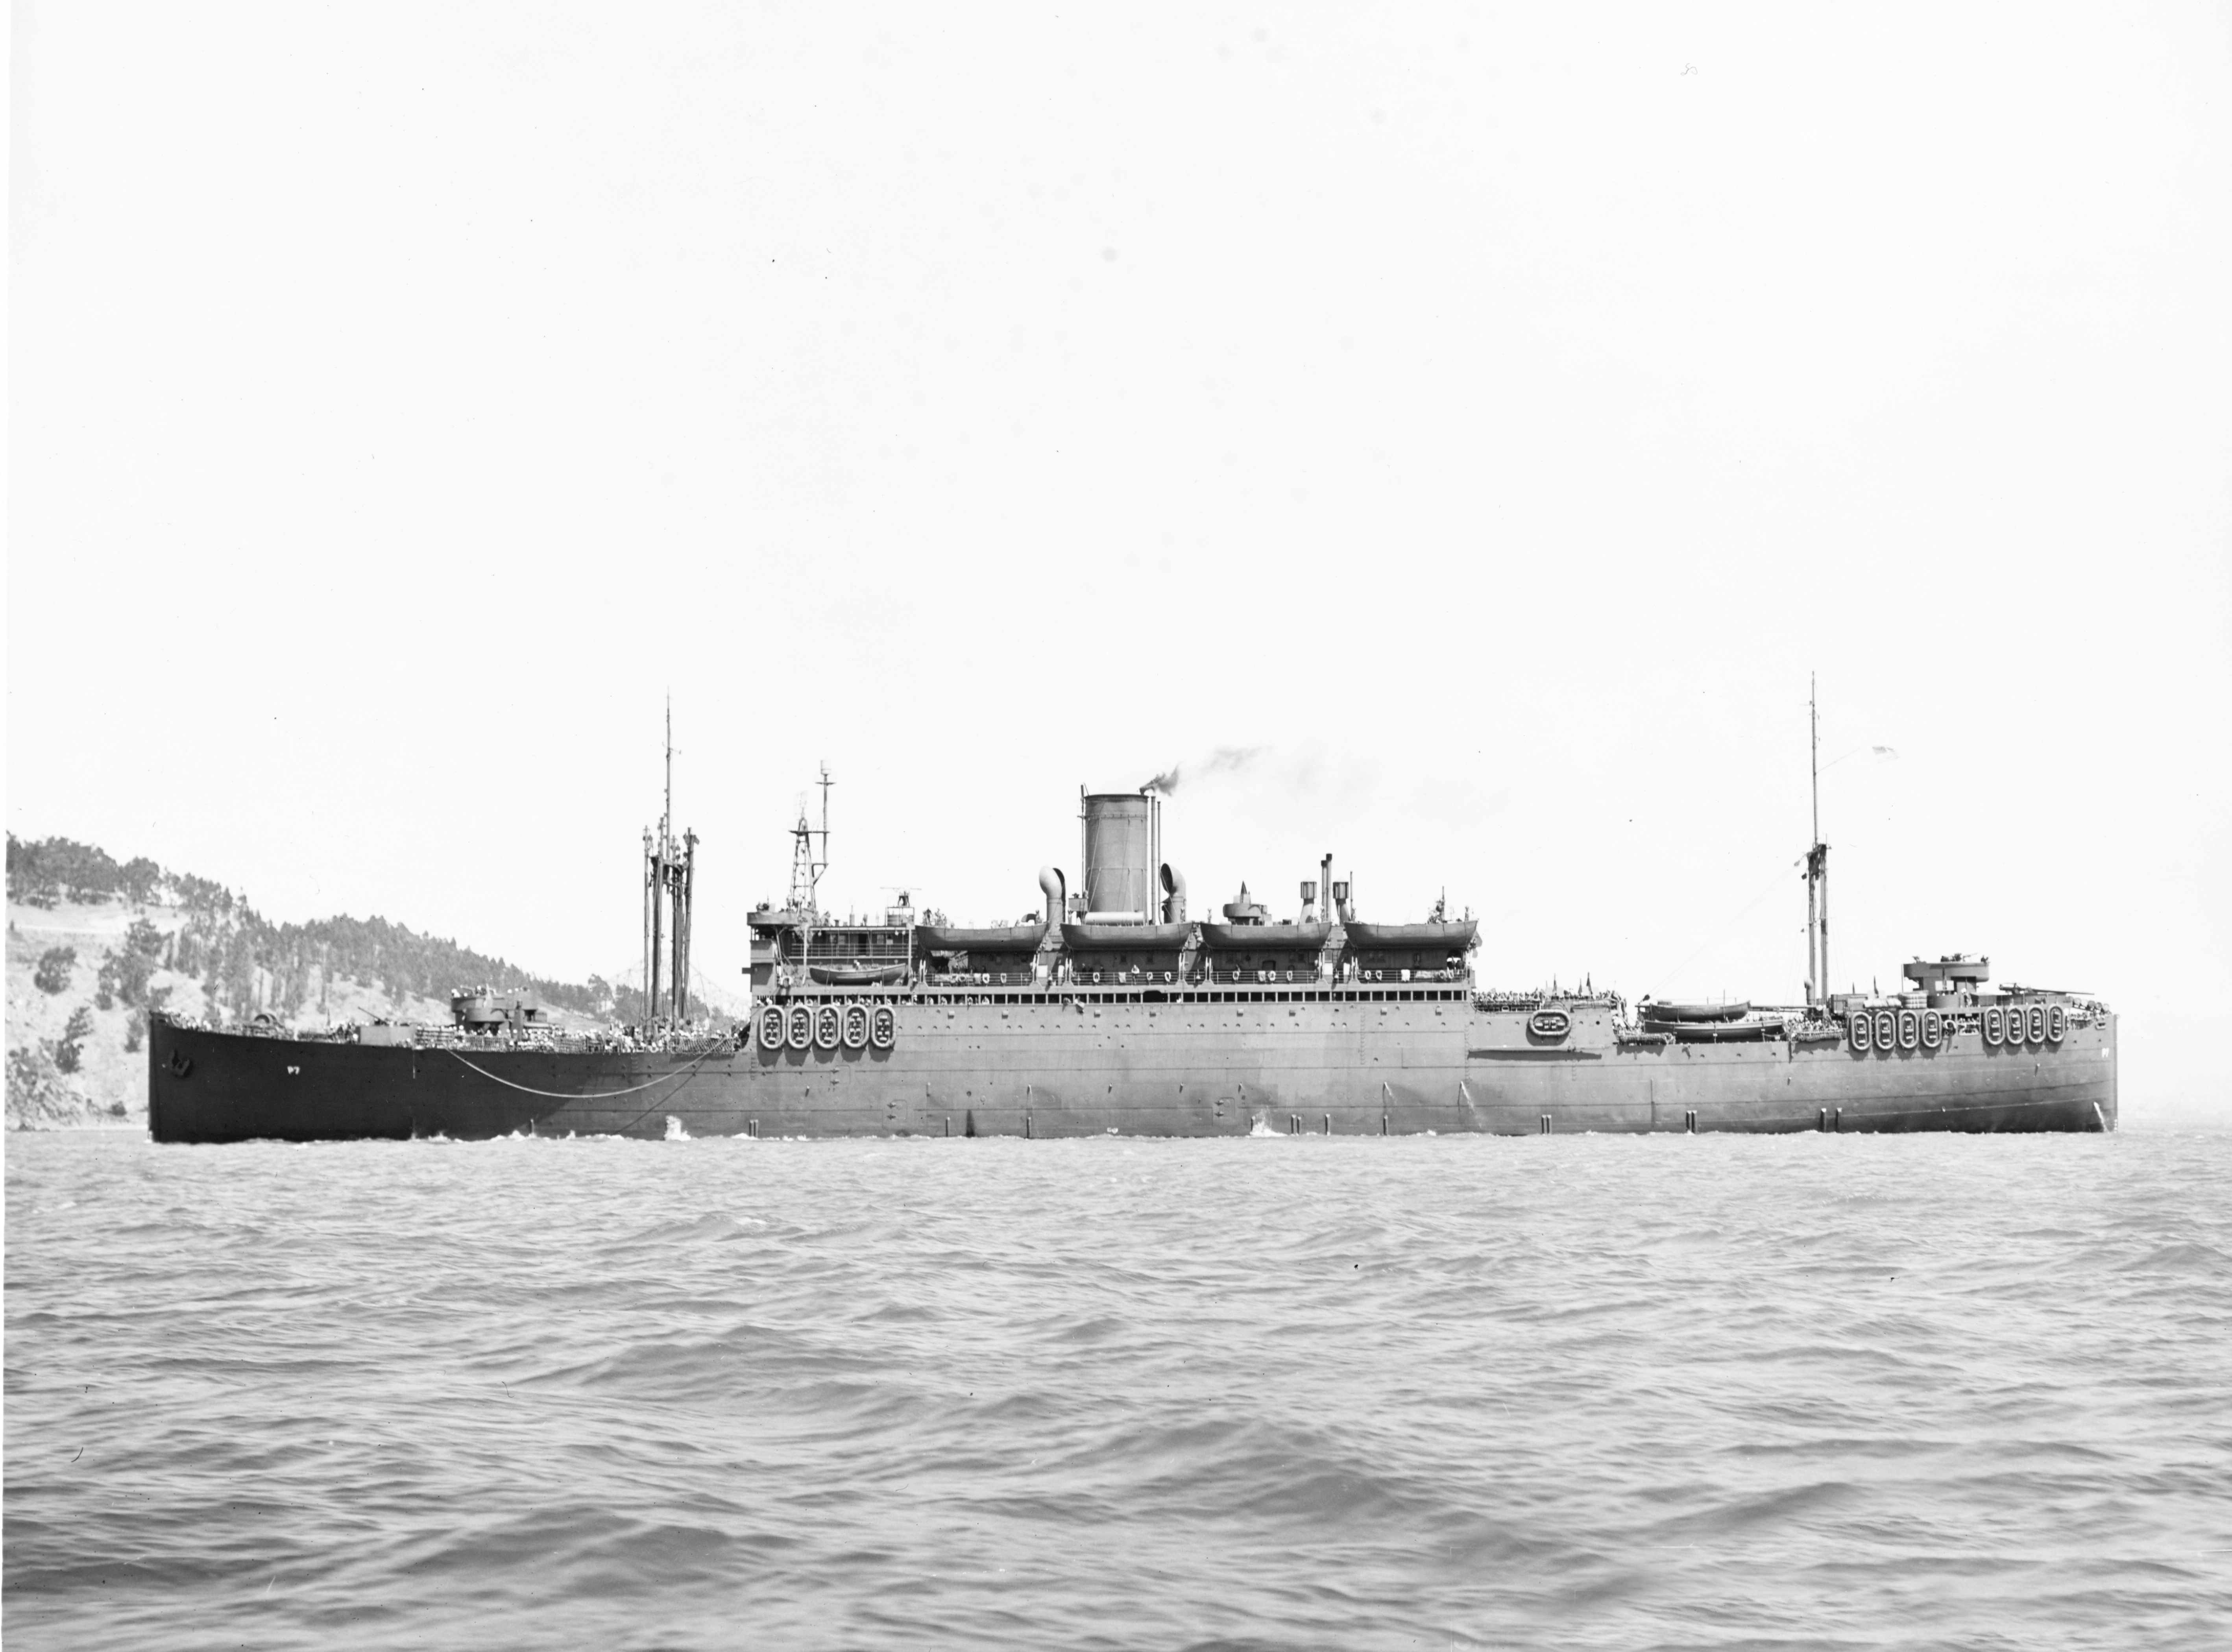 USS Wharton c. 1941